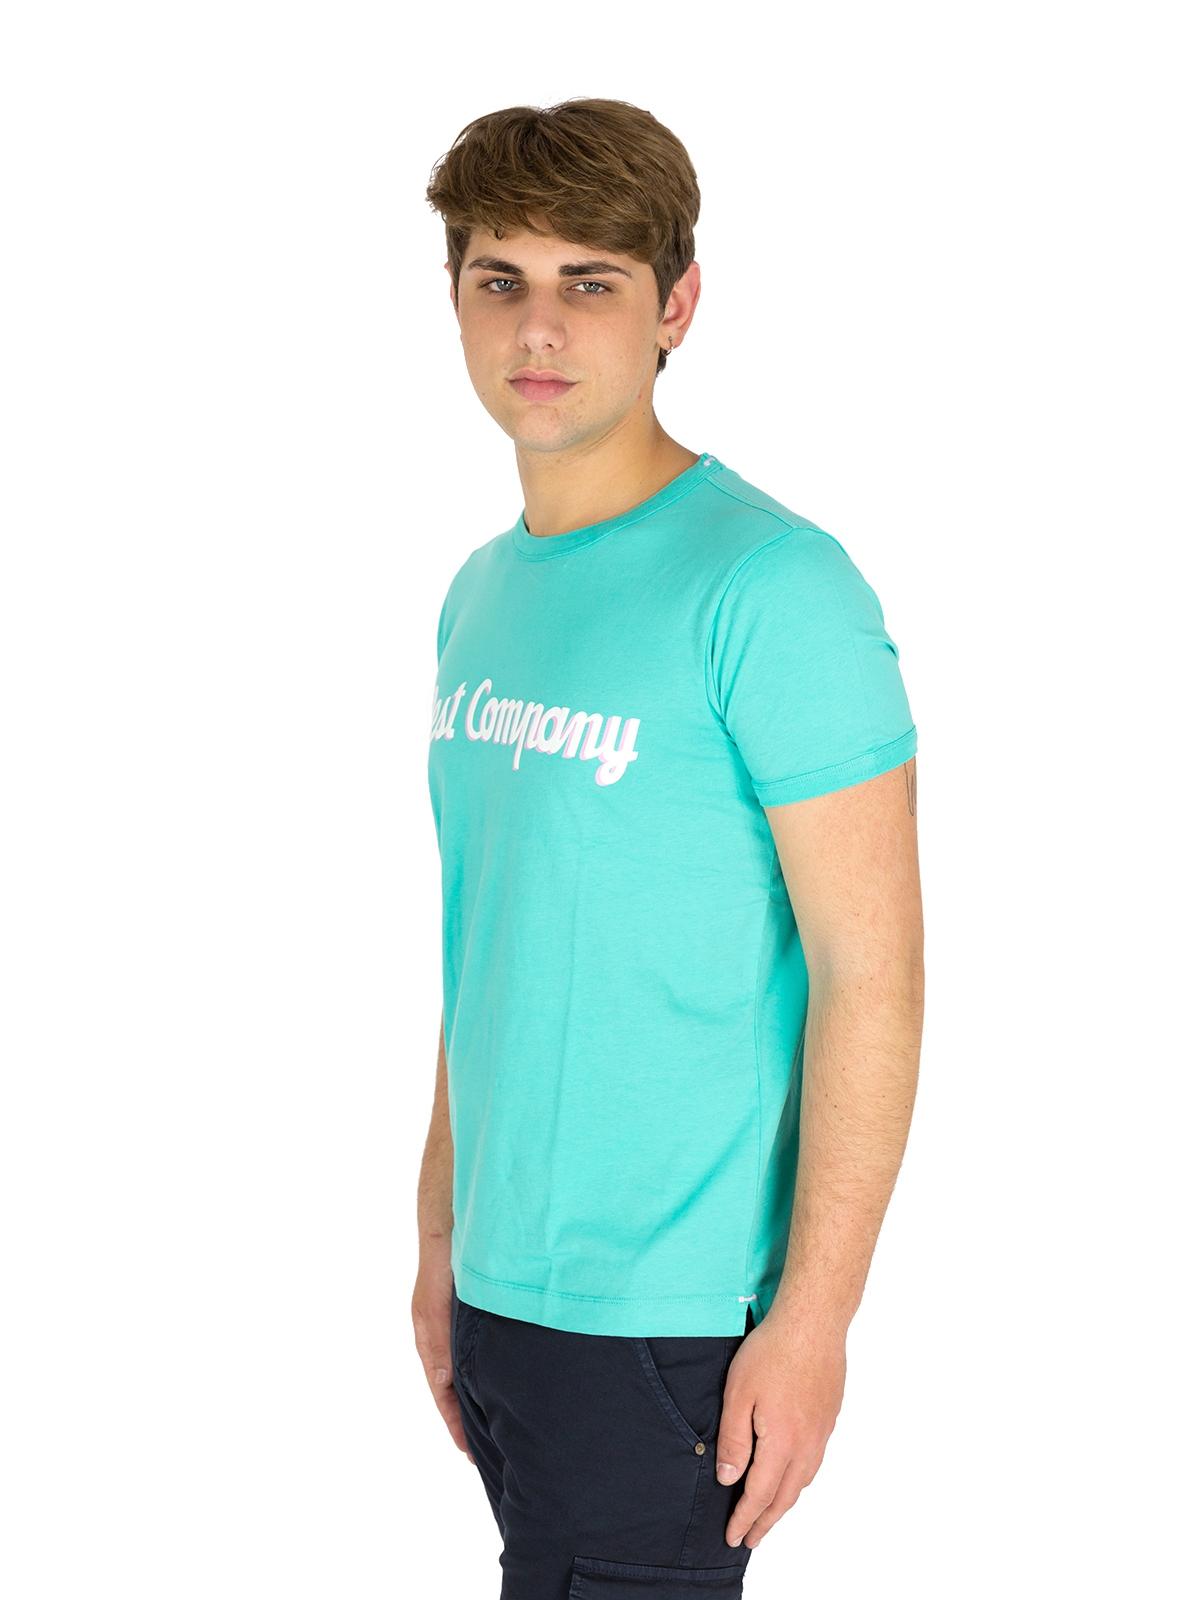 Best Company T-Shirt 692033